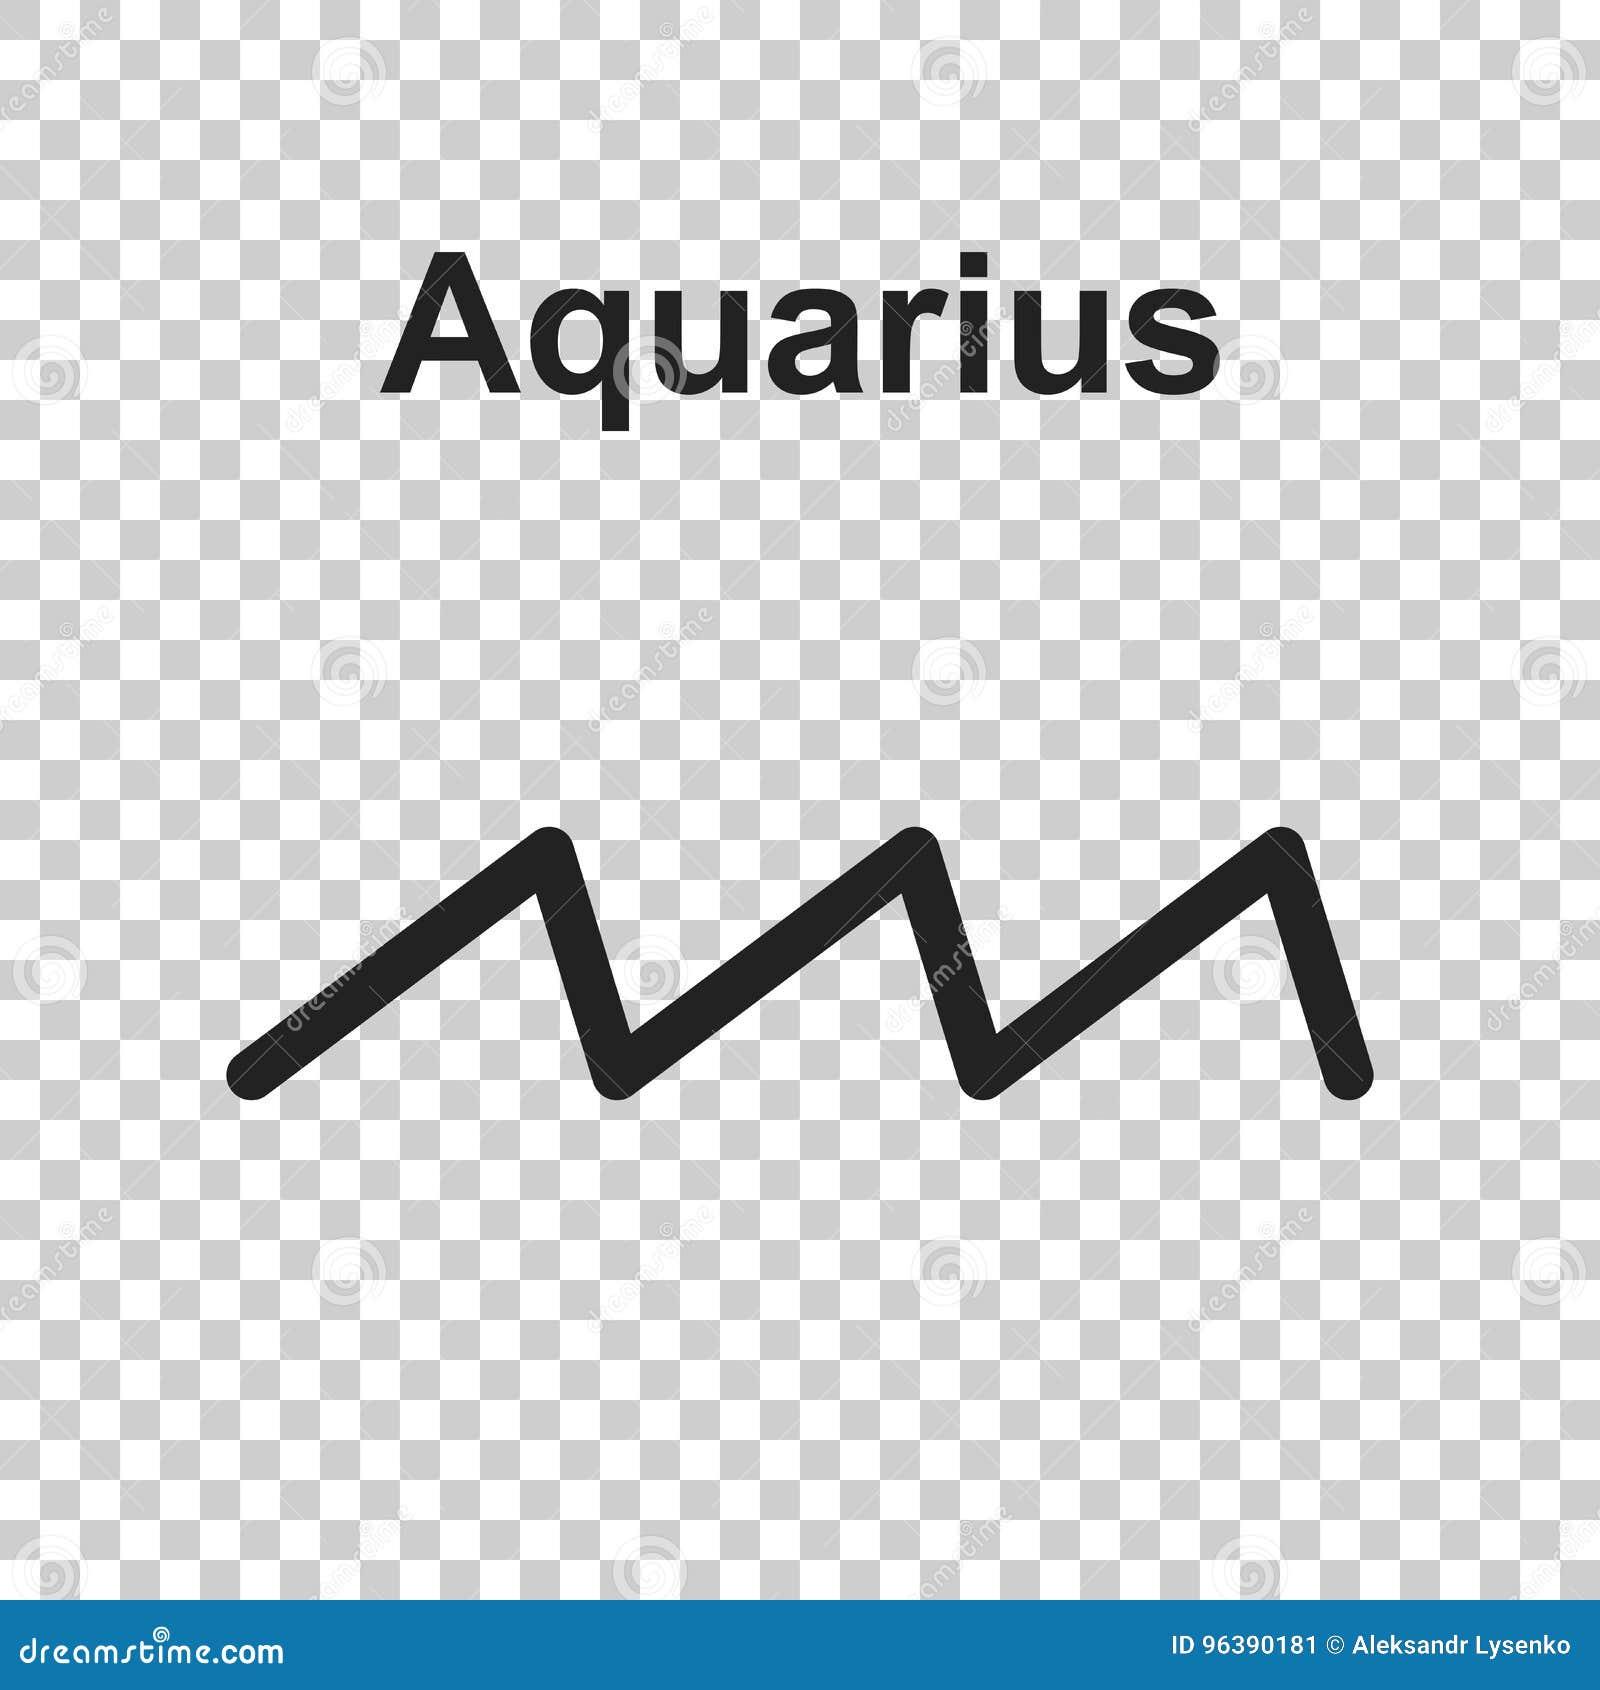 Aquarius Zodiac Sign Flat Astrology Vector Illustration On Whit